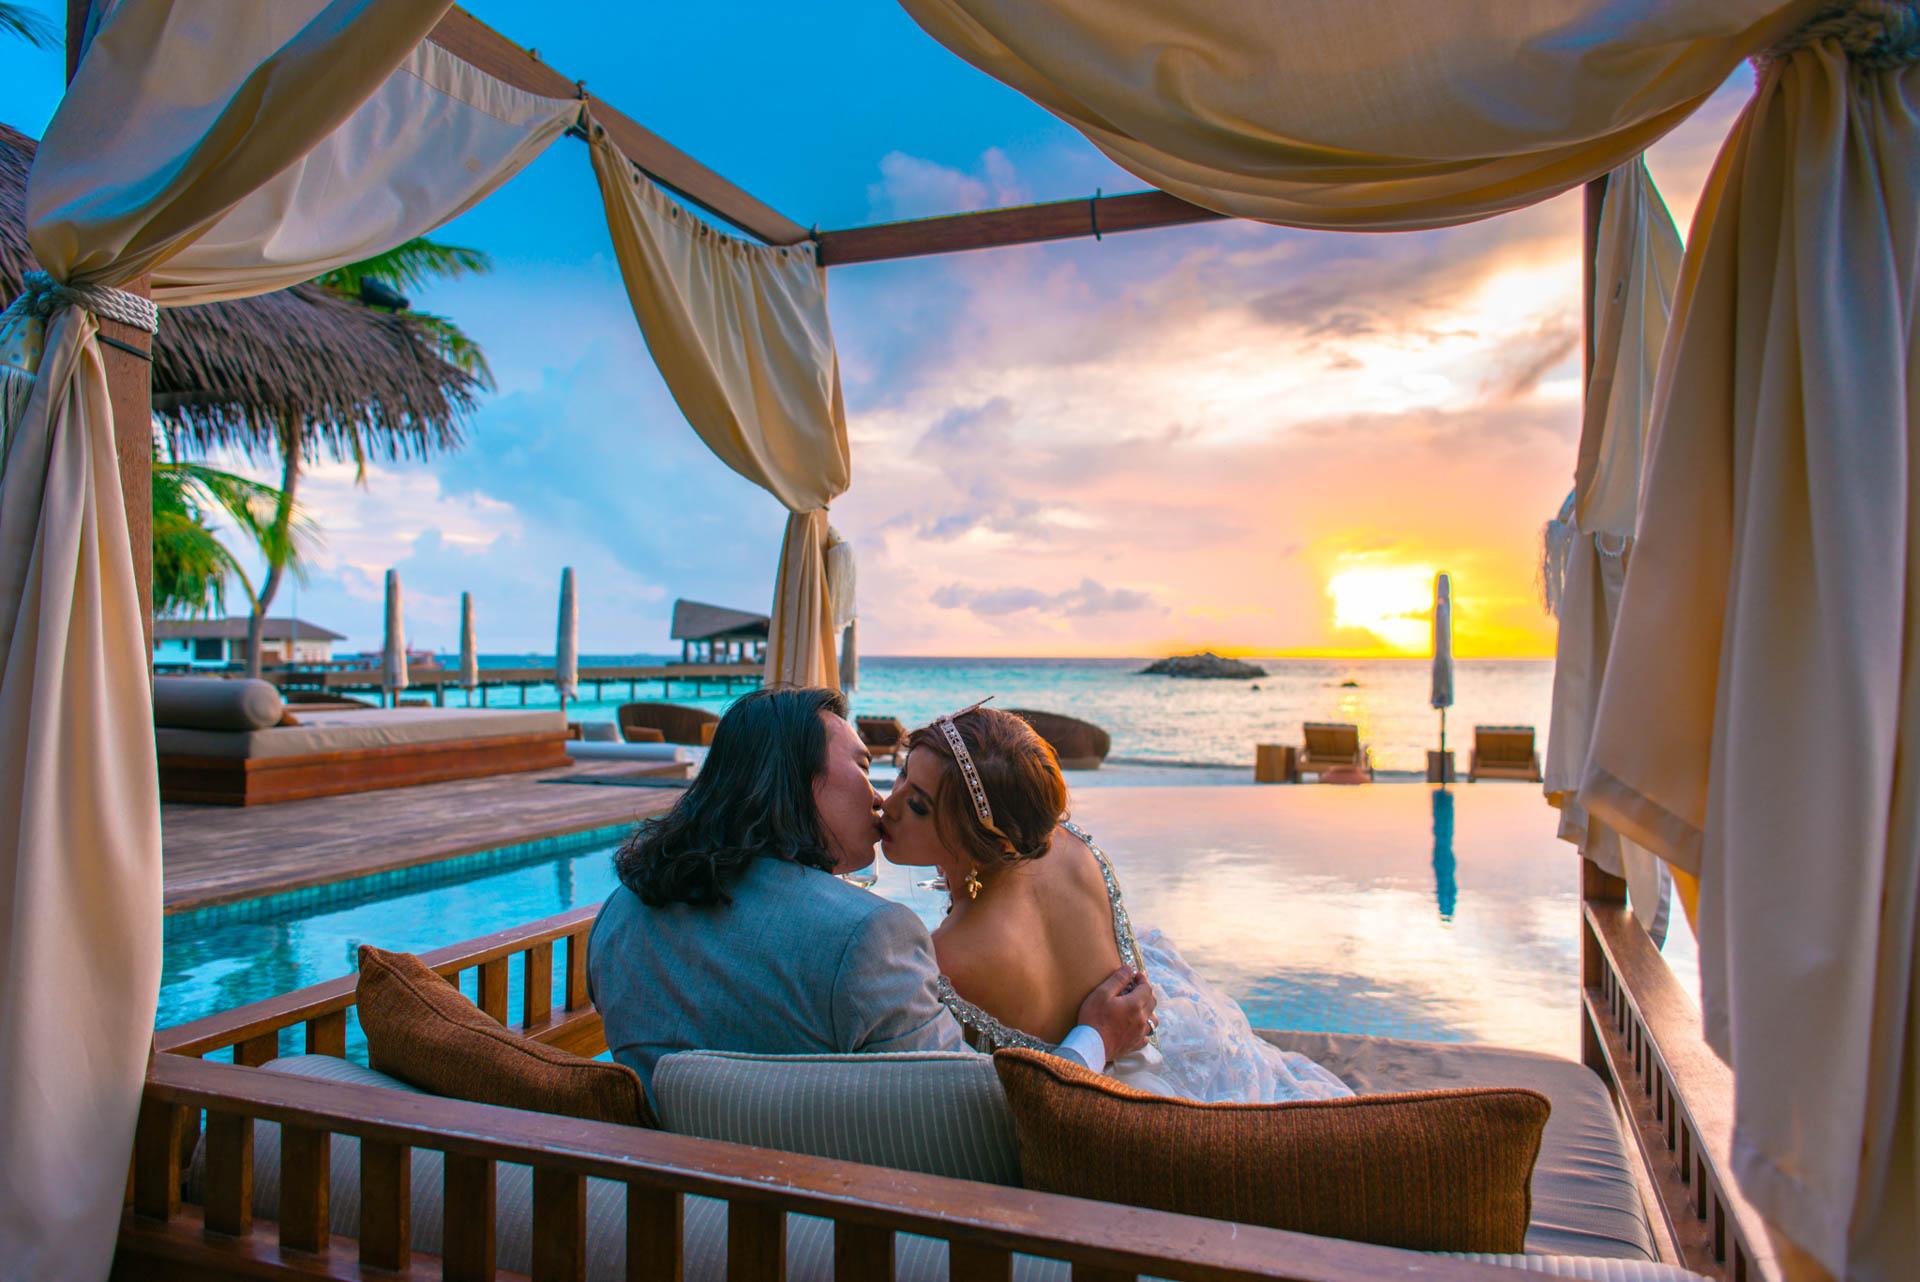 Chih Chao Yu Shan Destination Wedding at Residence Maldives 3